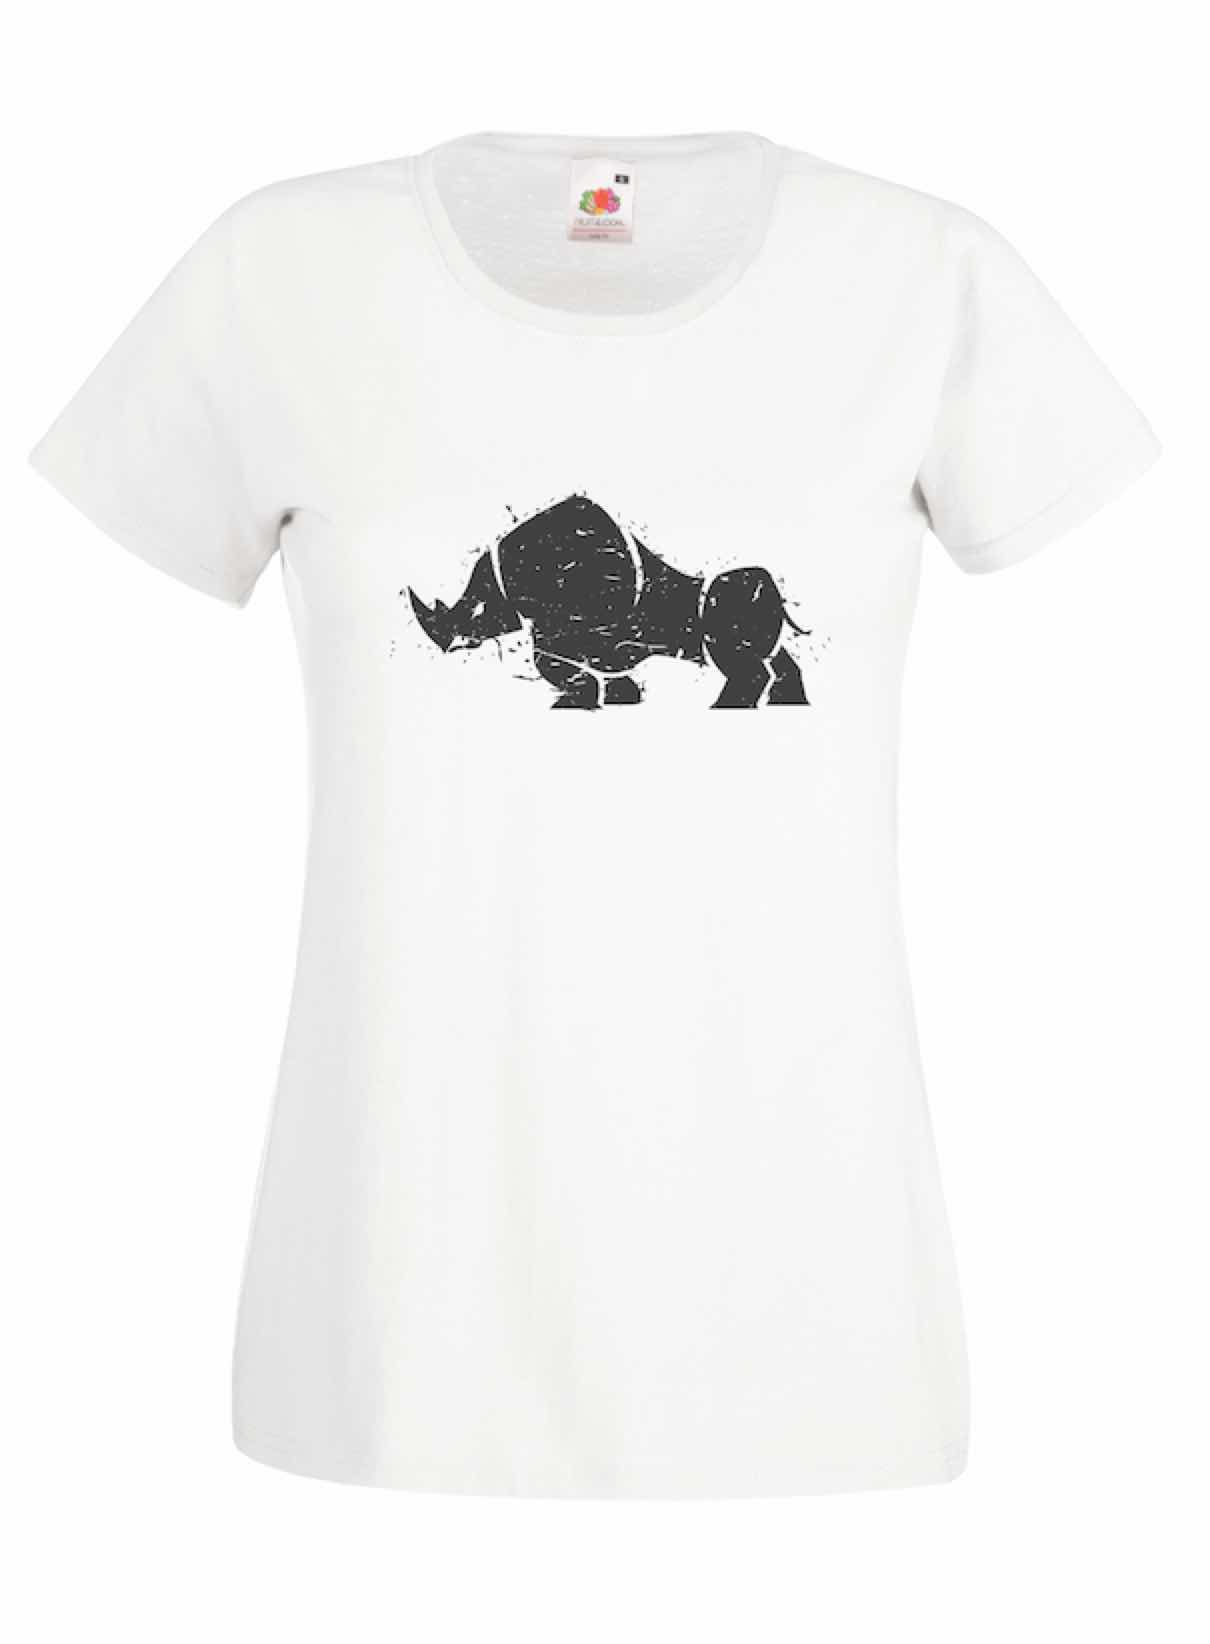 Rhino design for t-shirt, hoodie & sweatshirt